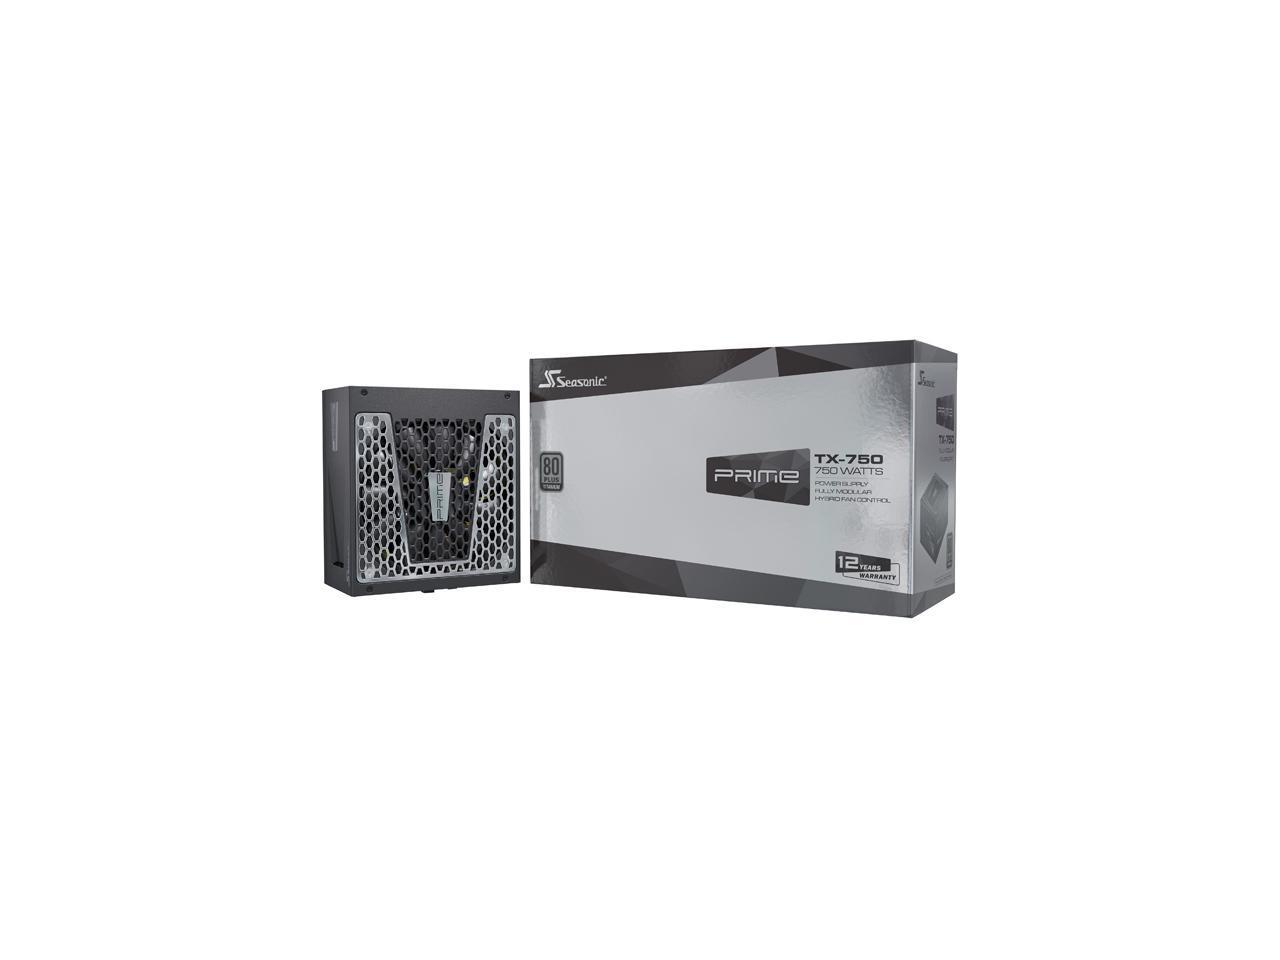 750W Seasonic PRIME TX-750, 80+ Titanium, Full Modular Power Supply @Newegg (AR) $148